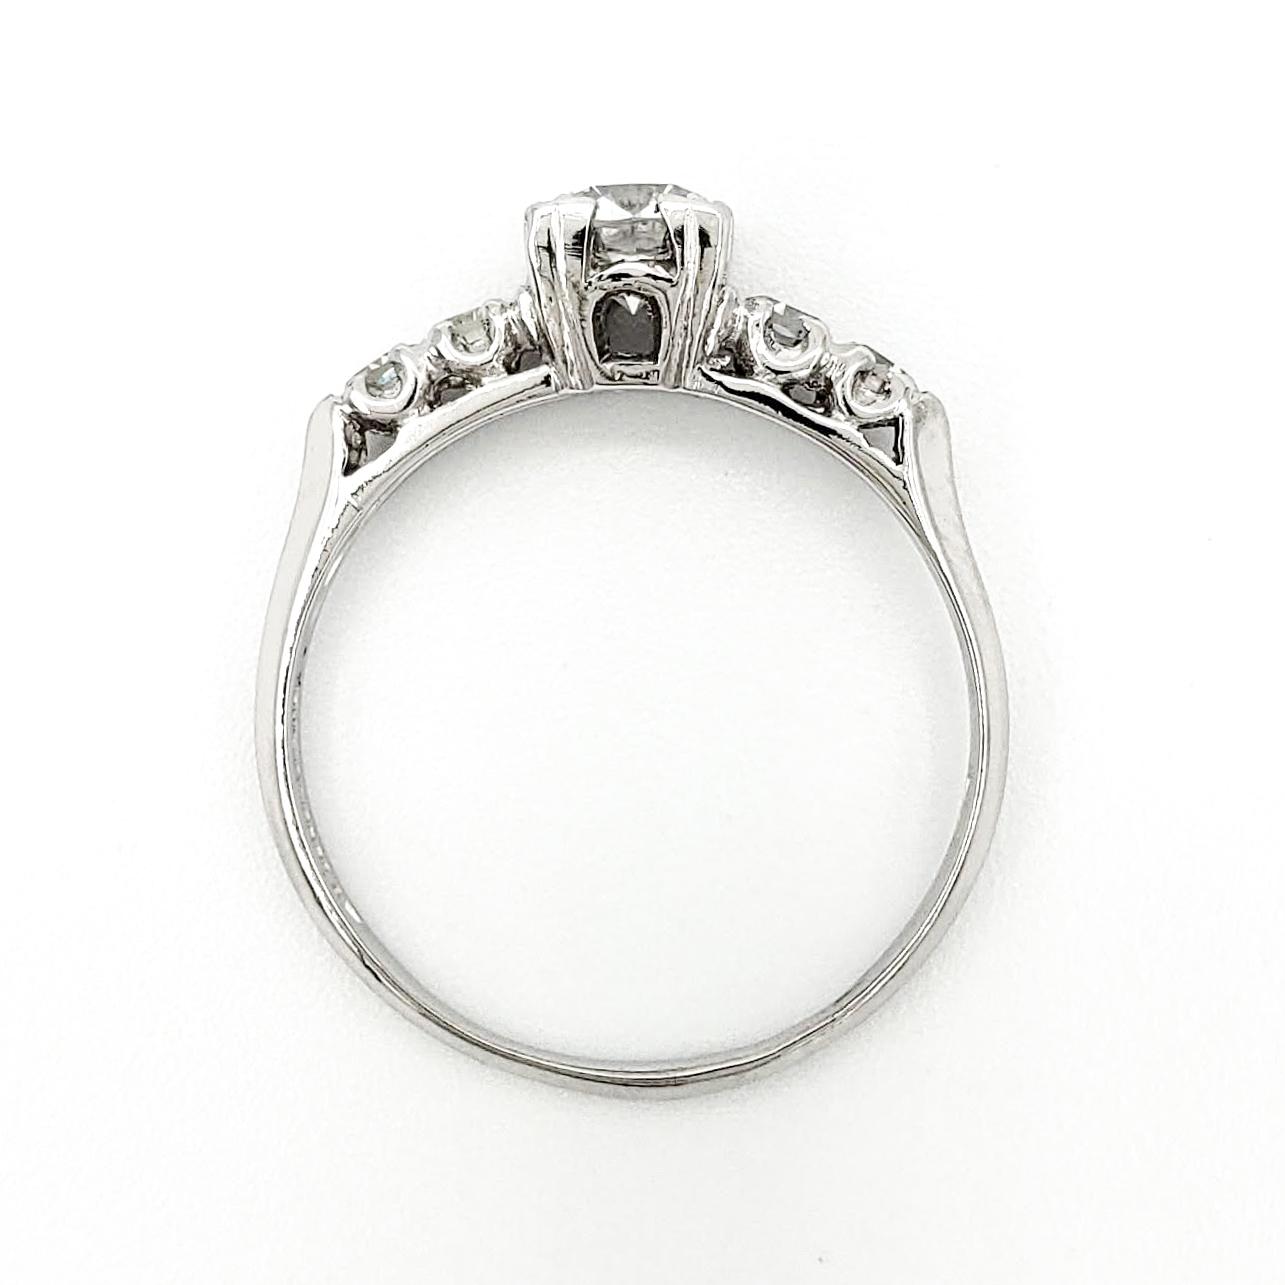 vintage-platinum-engagement-ring-with-0-41-carat-round-brilliant-cut-diamond-egl-e-vs1